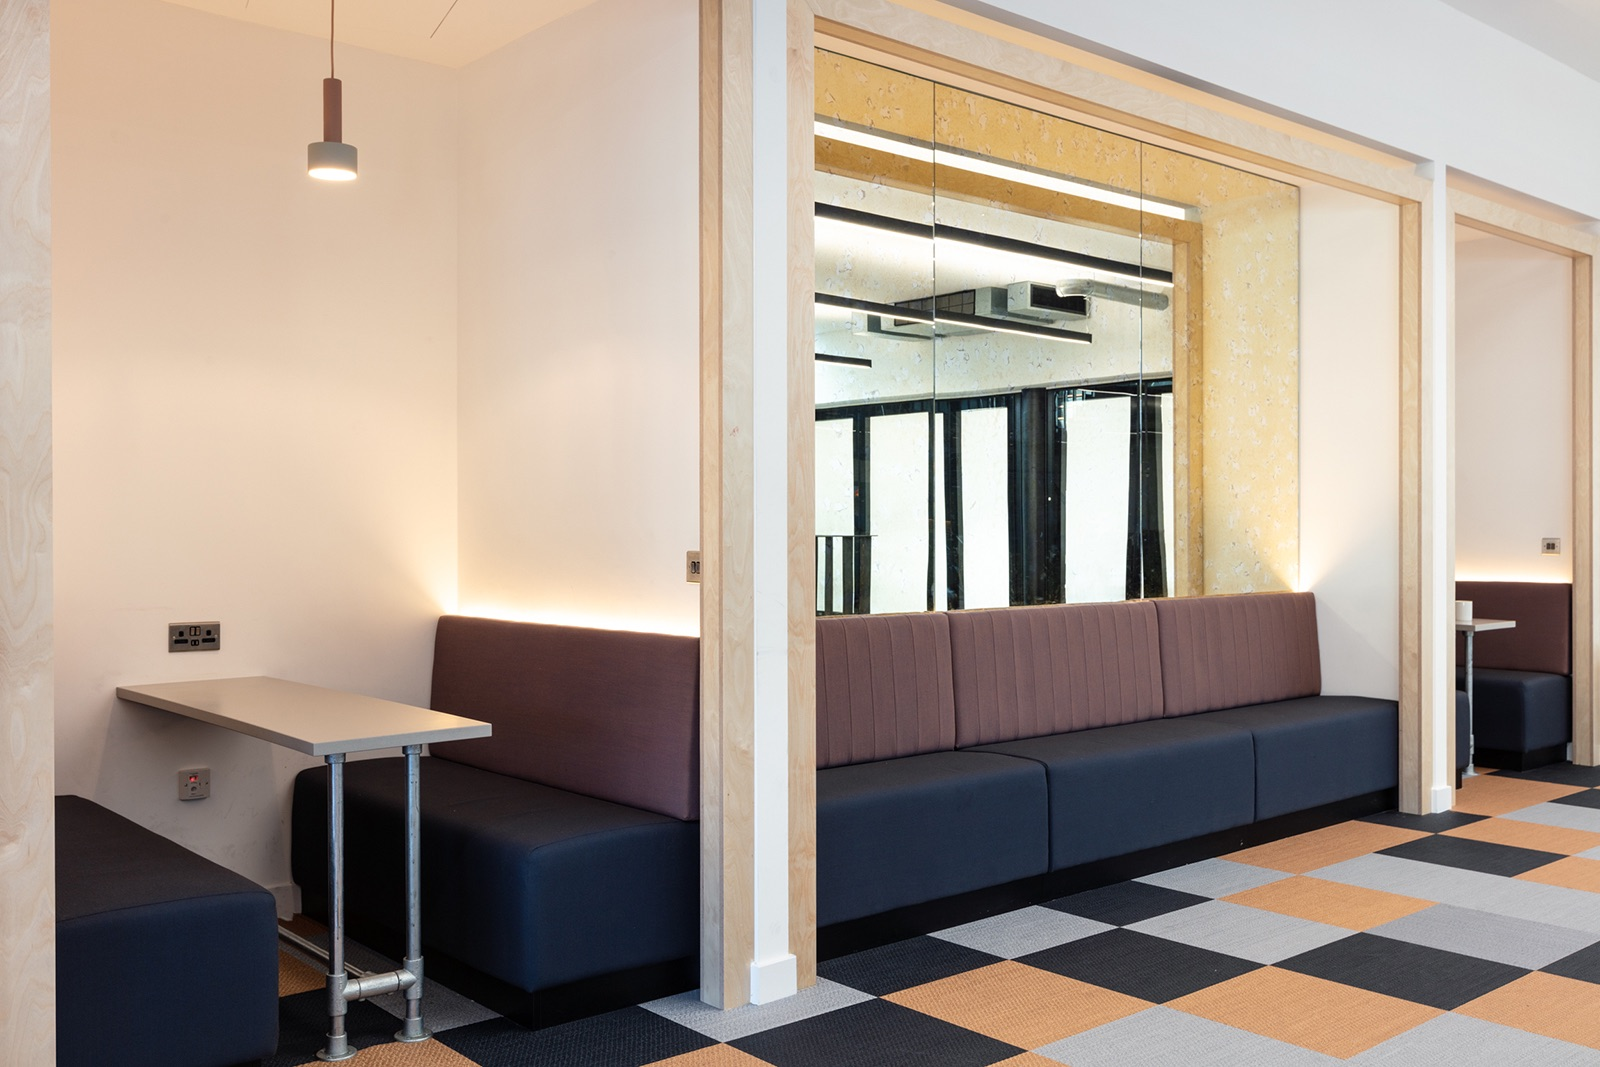 redbull-london-office-6